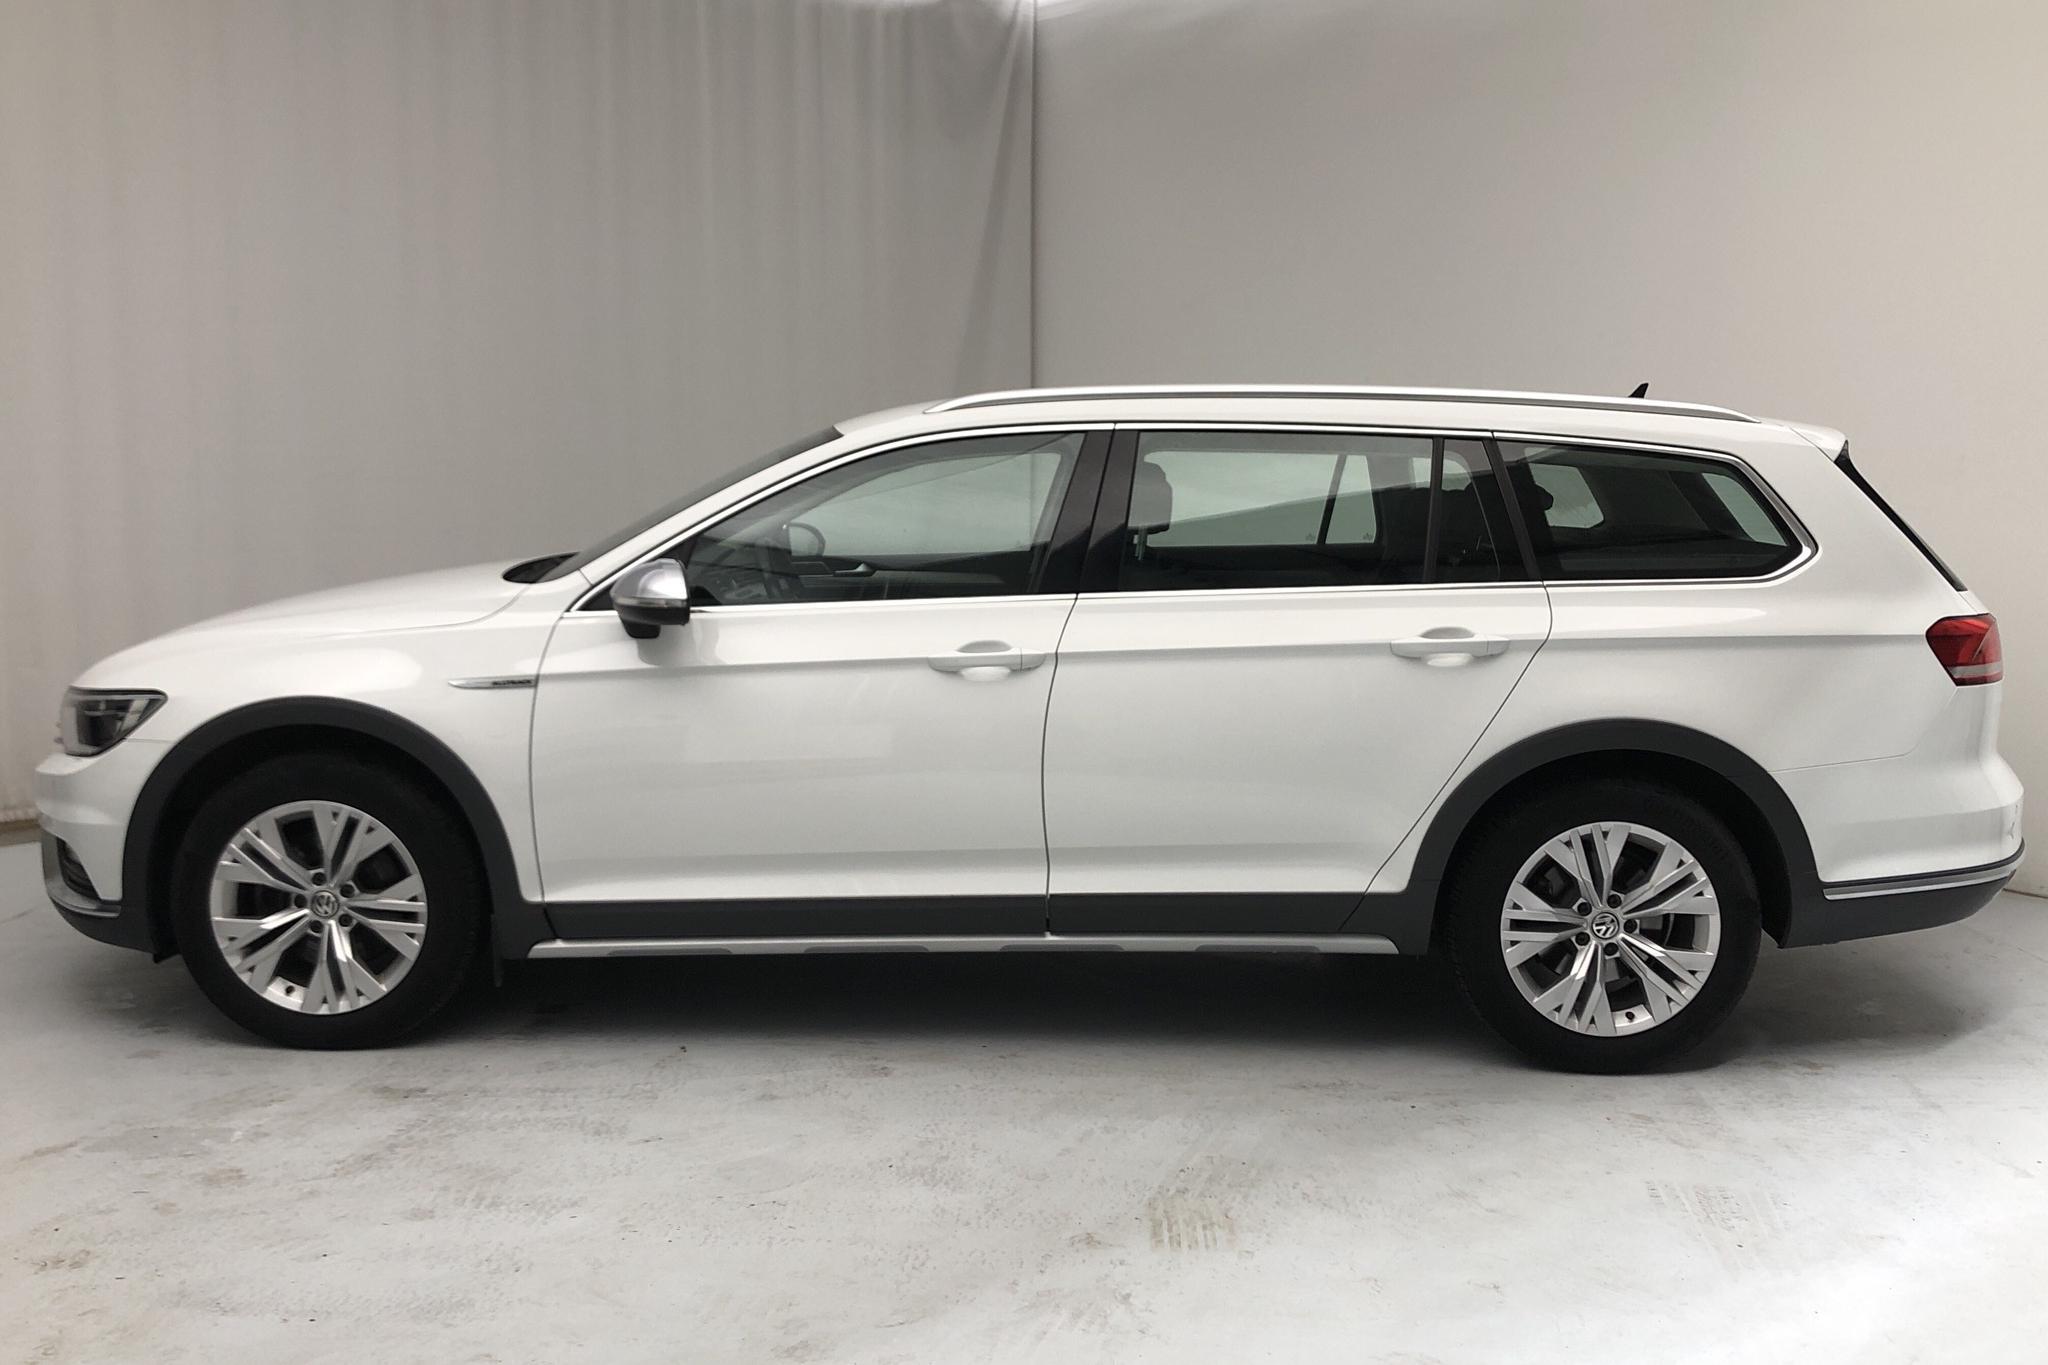 VW Passat Alltrack 2.0 TDI Sportscombi 4MOTION (190hk) - 62 340 km - Automatic - white - 2017